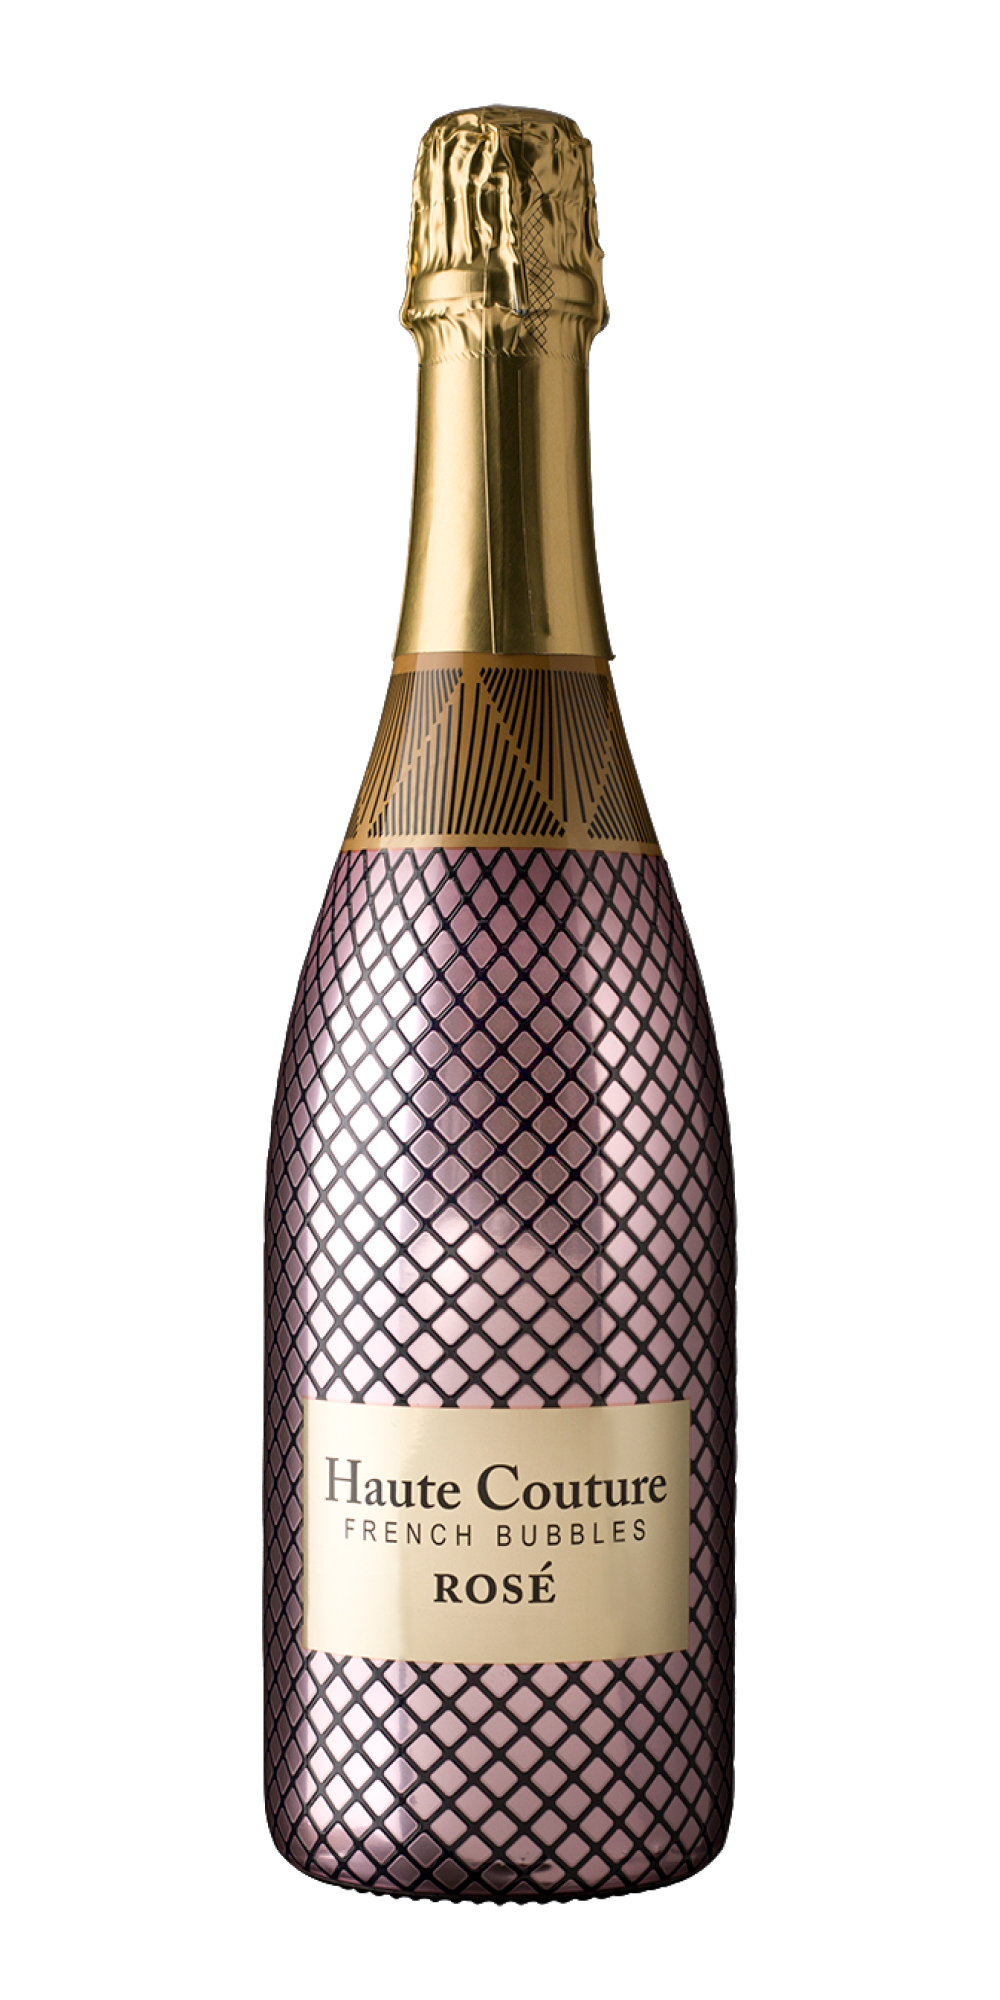 Haute Couture Rose NV